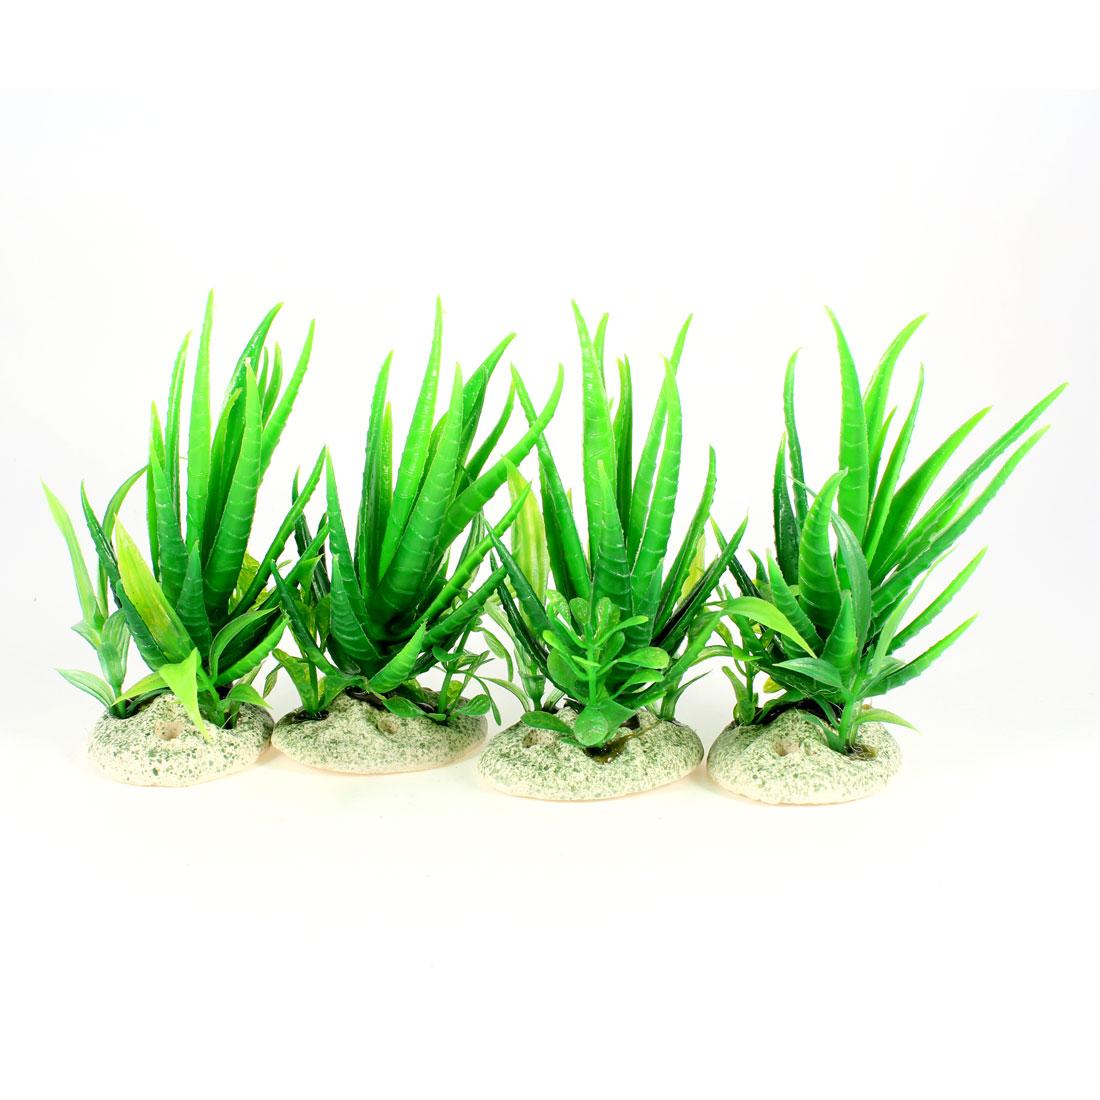 4Pcs Aquascaping 12cm Green Plastic Aloe Plant Grass for Fish Tank